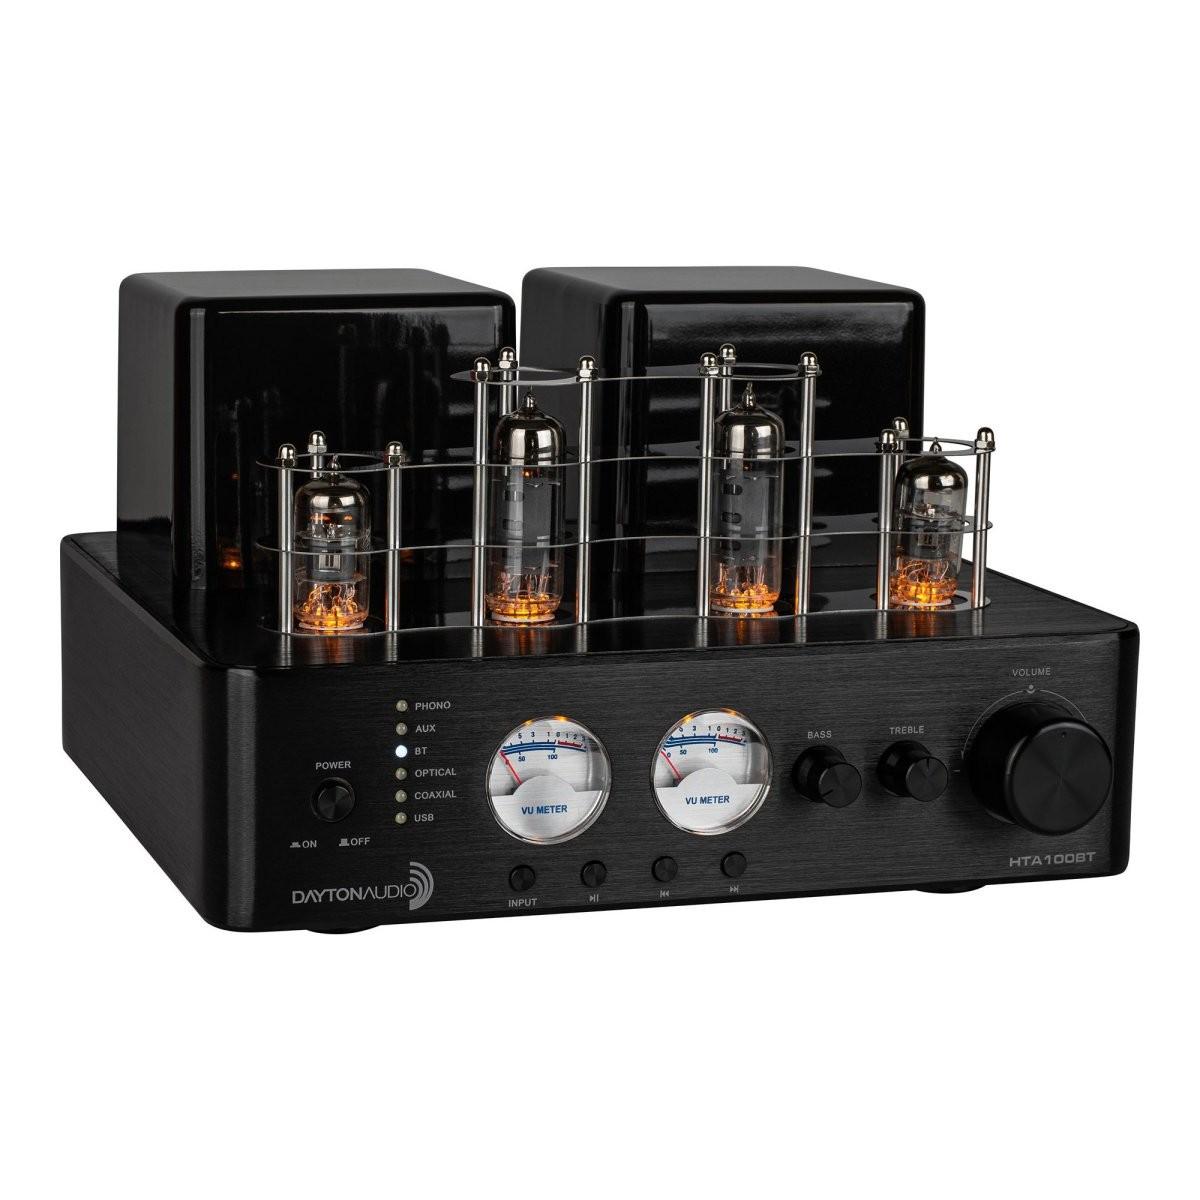 DAYTON AUDIO HTA100BT Hybrid Tube Amplifier BT5.0 Phono 2x50W / 4 Ohm